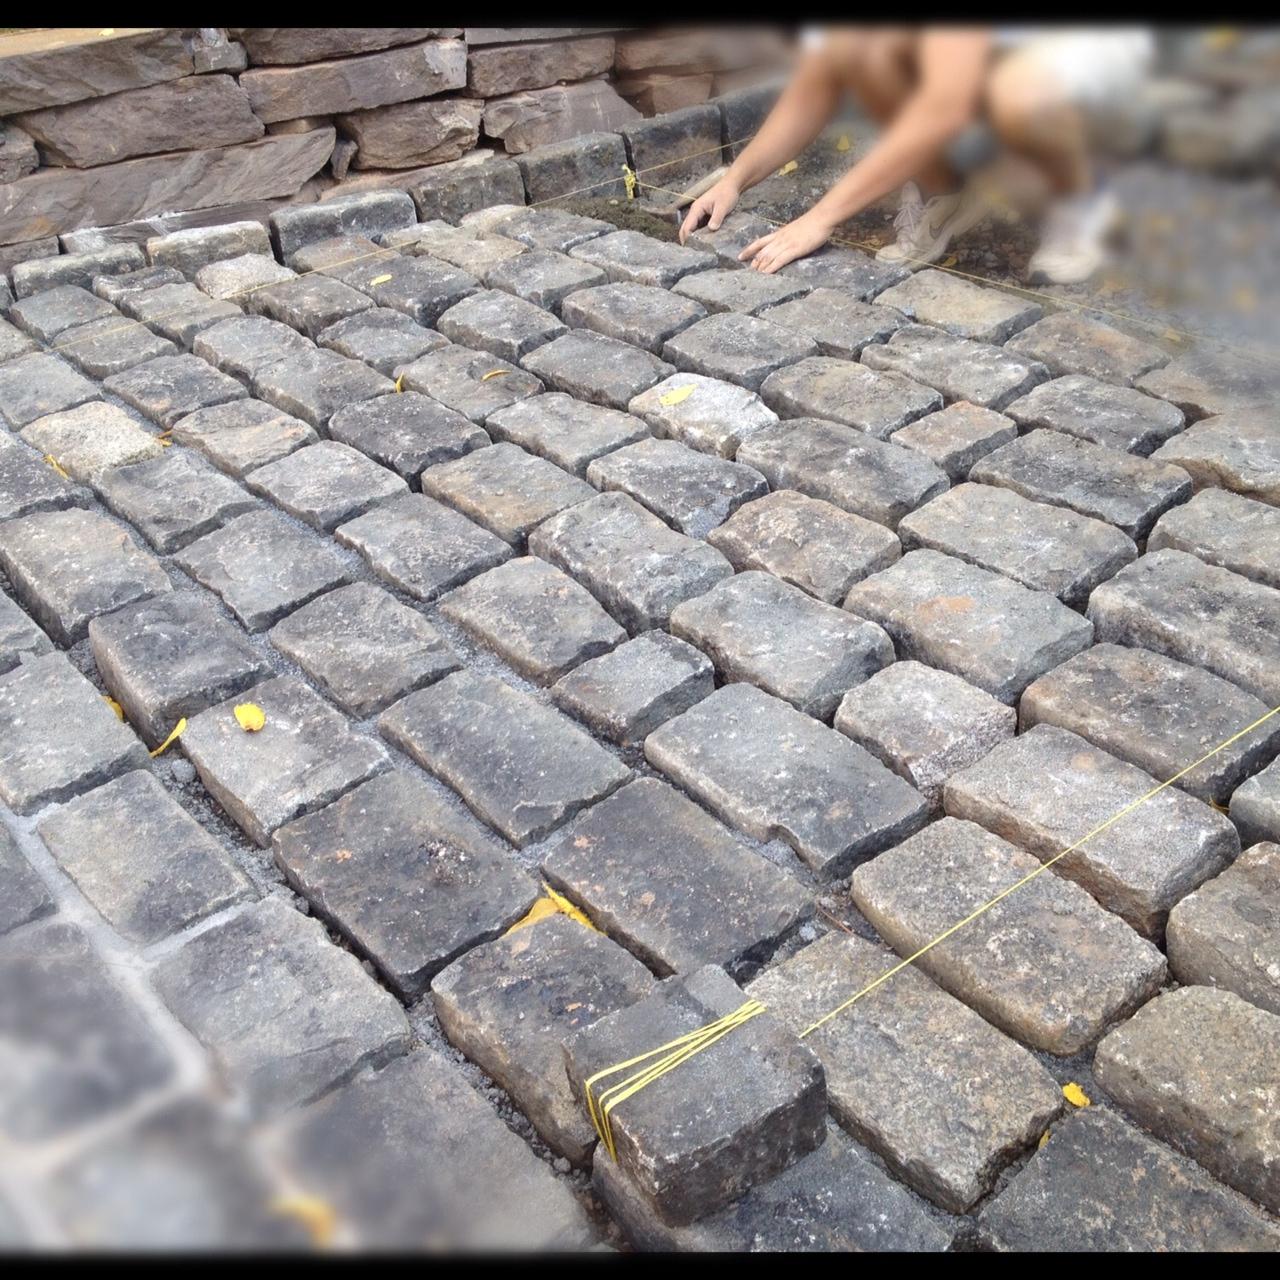 Concrete Cobble Street : High street market driveway update cobblestone apron